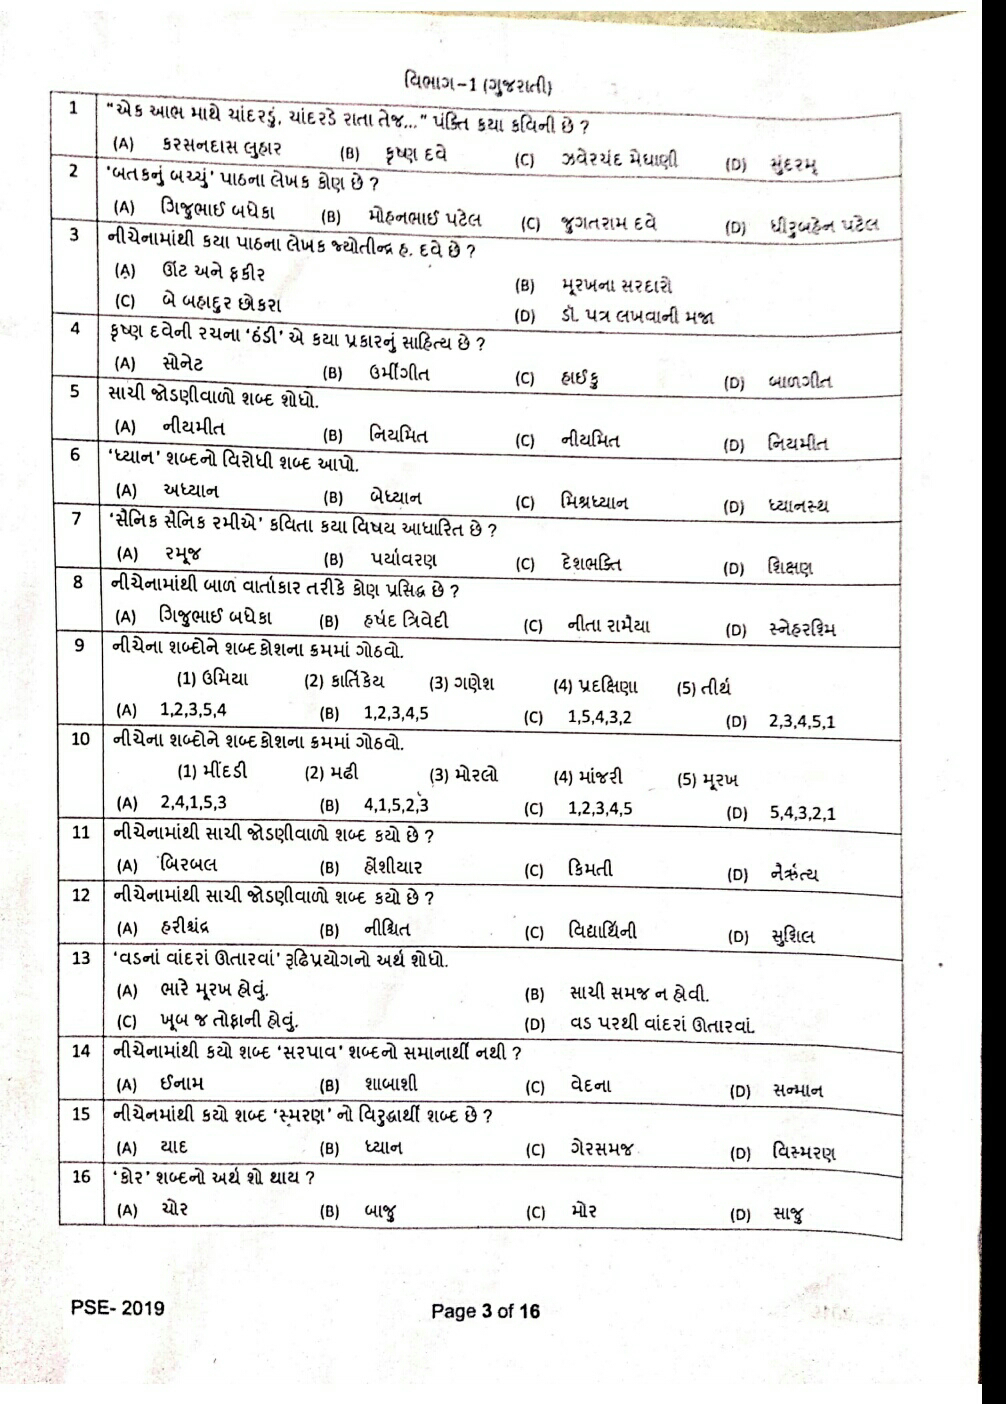 PSE exam paper std 6 2019